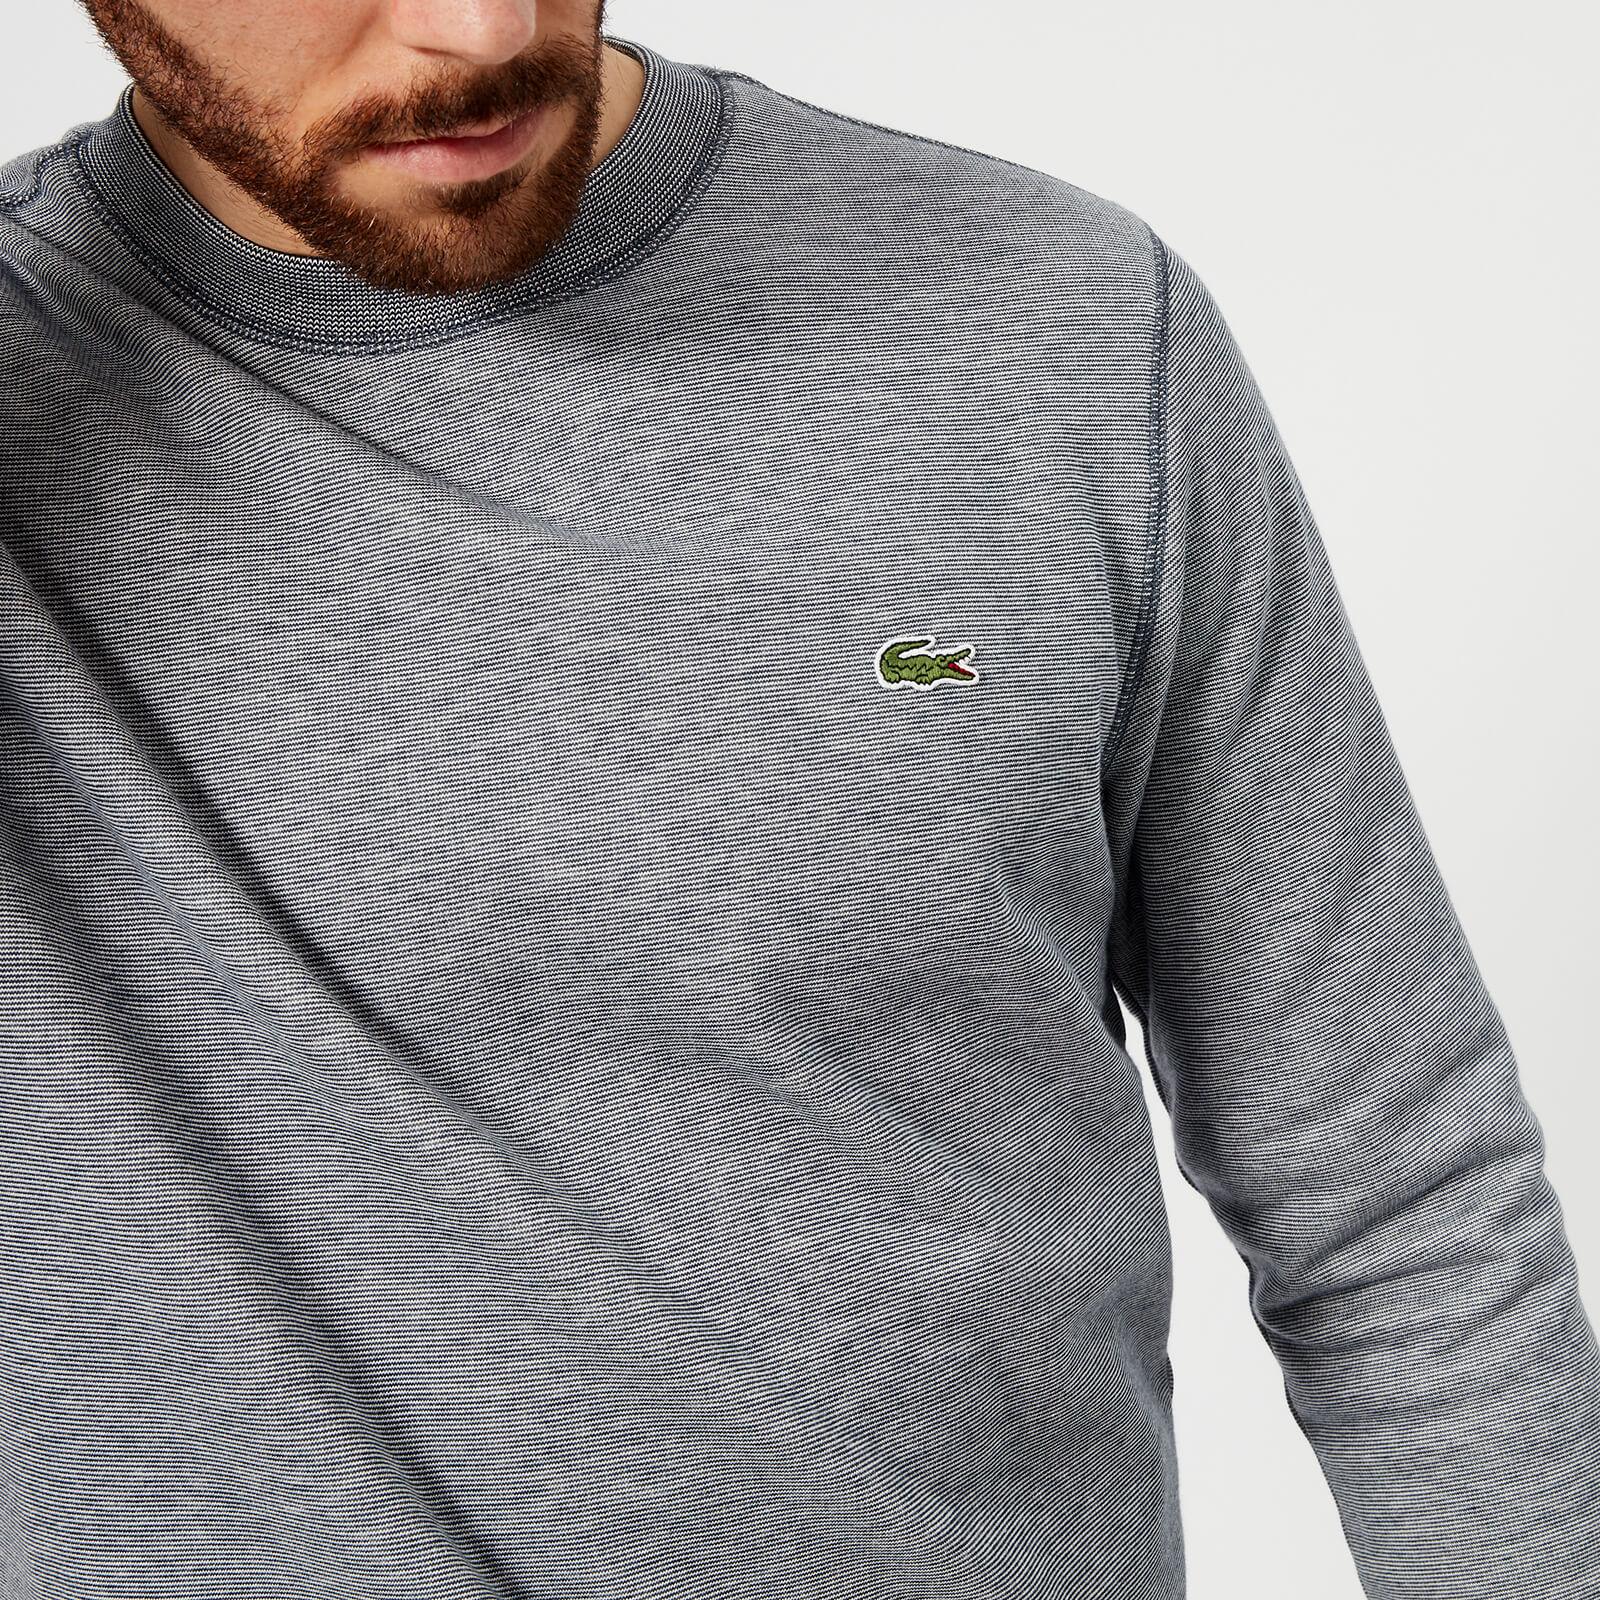 f4d62770 Lacoste Men's Crew Neck Sweatshirt - Navy Blue/Flour